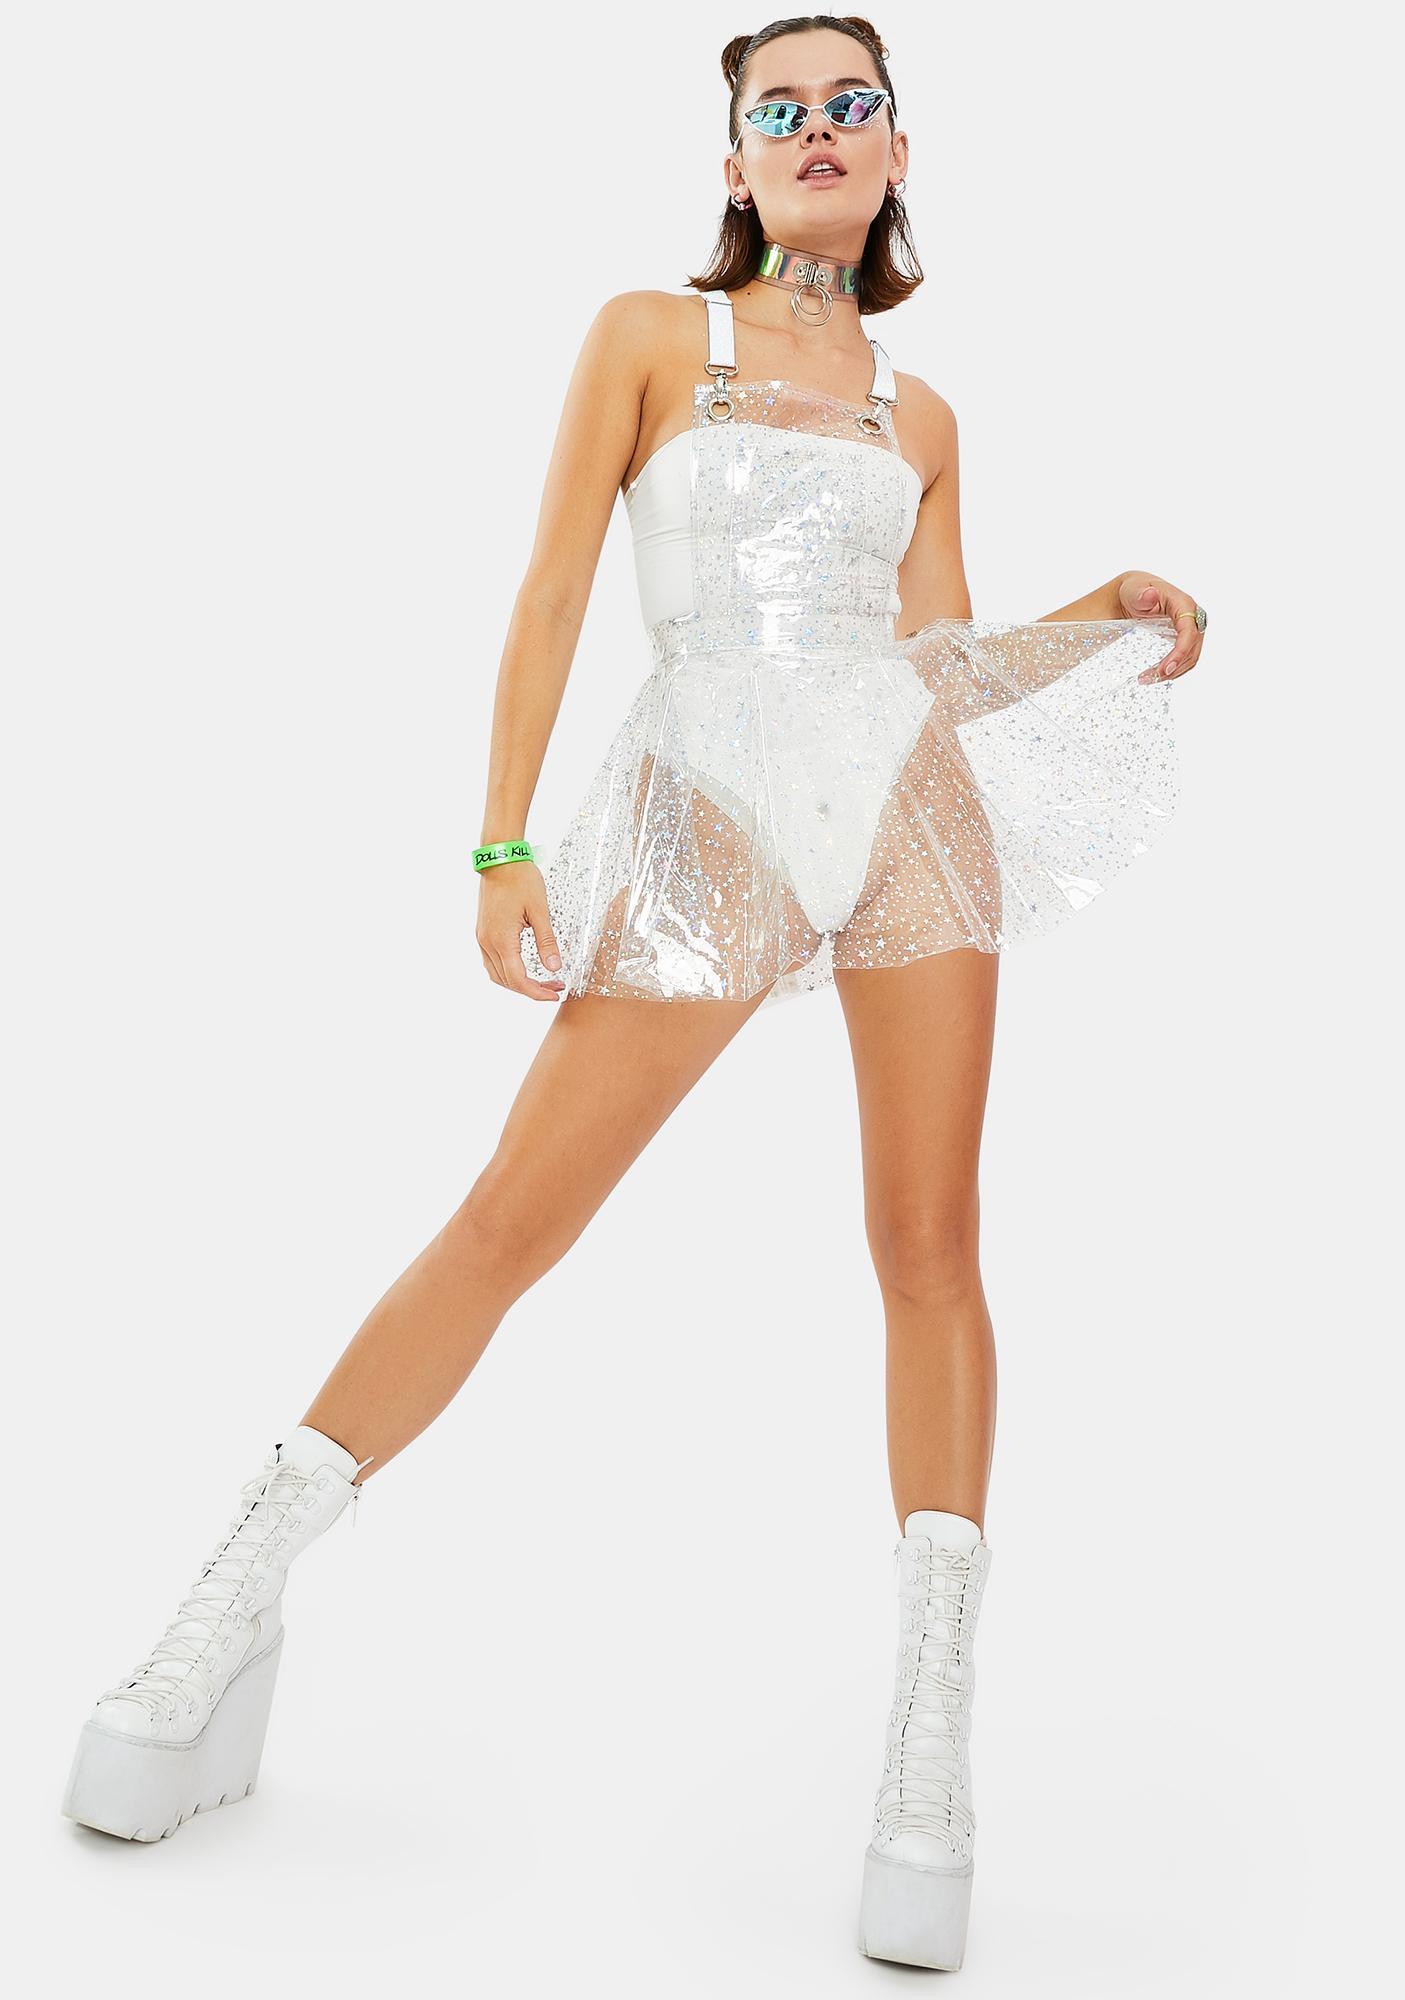 Crystal Clouds PVC Dress